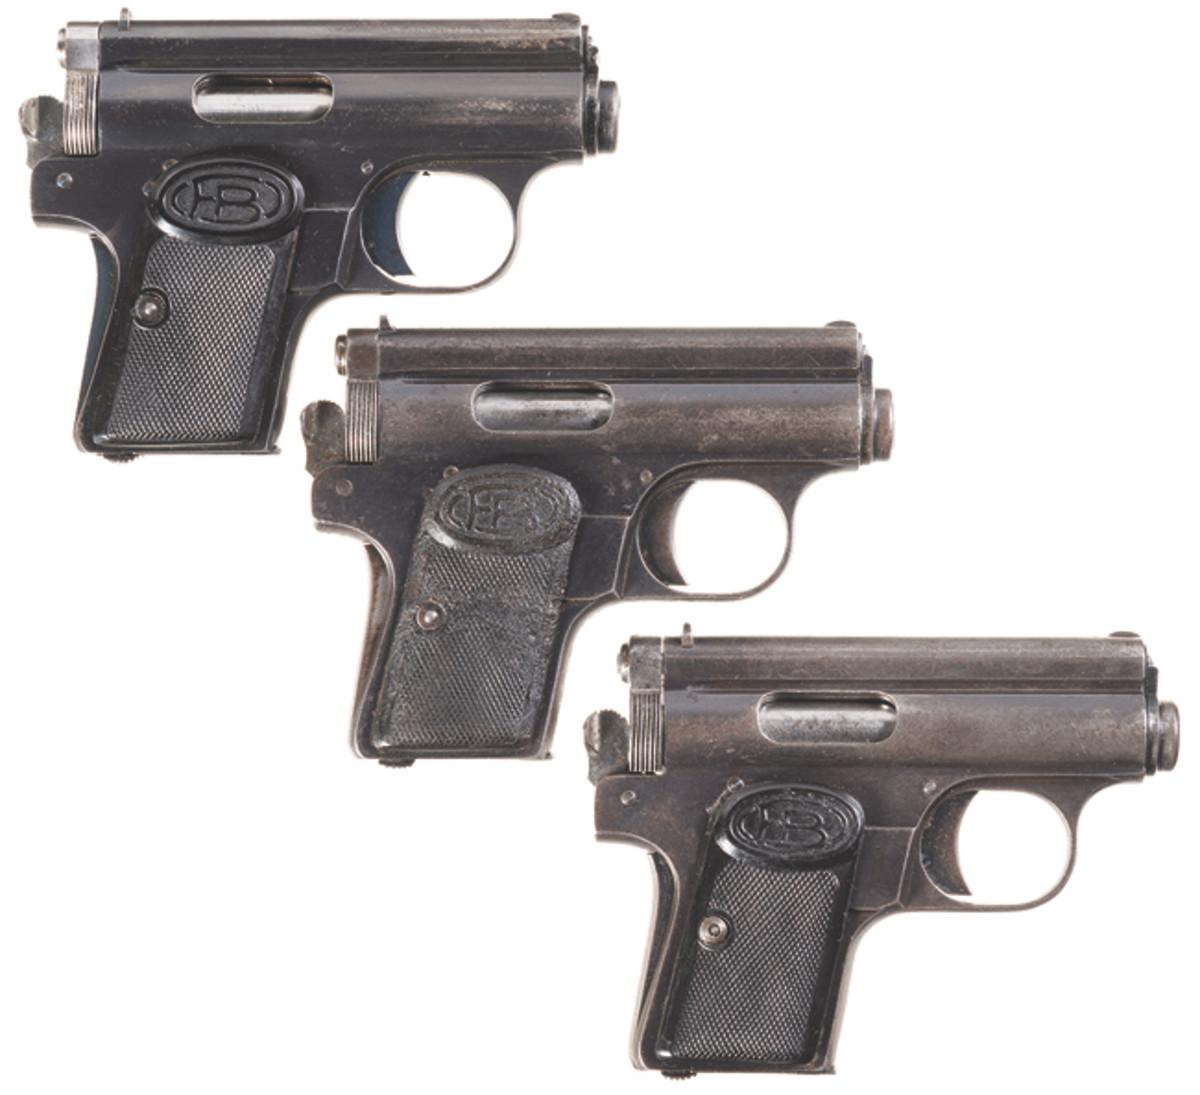 LOT649-Three Hungarian Semi-Automatic Pistols